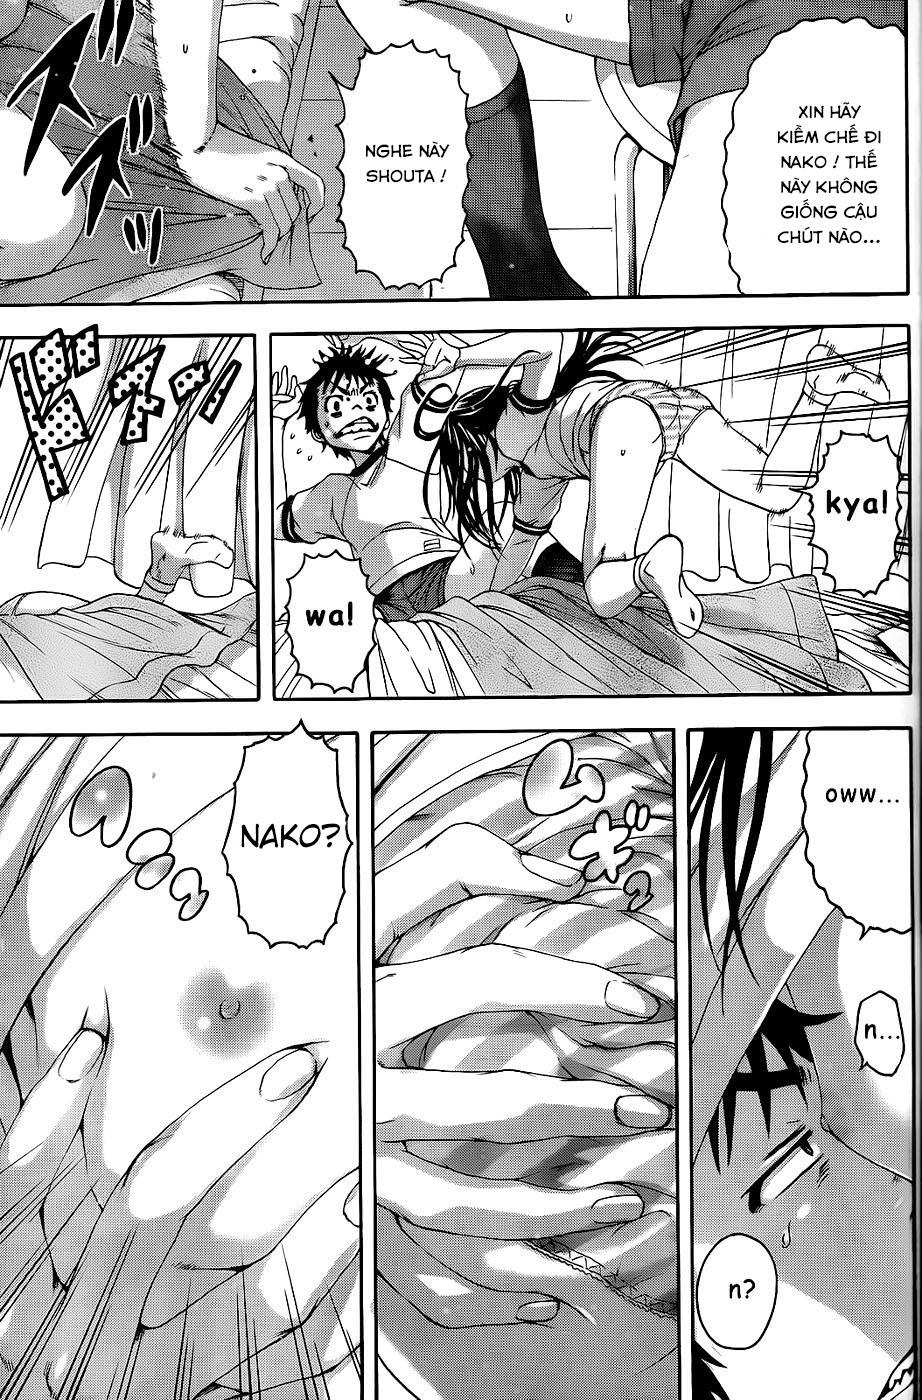 Hình ảnh Mujaki%2Bno%2Brakuen%2B %2Bchap%2B48025 in [Siêu phẩm] Mujaki no Rakuen Hentai Series